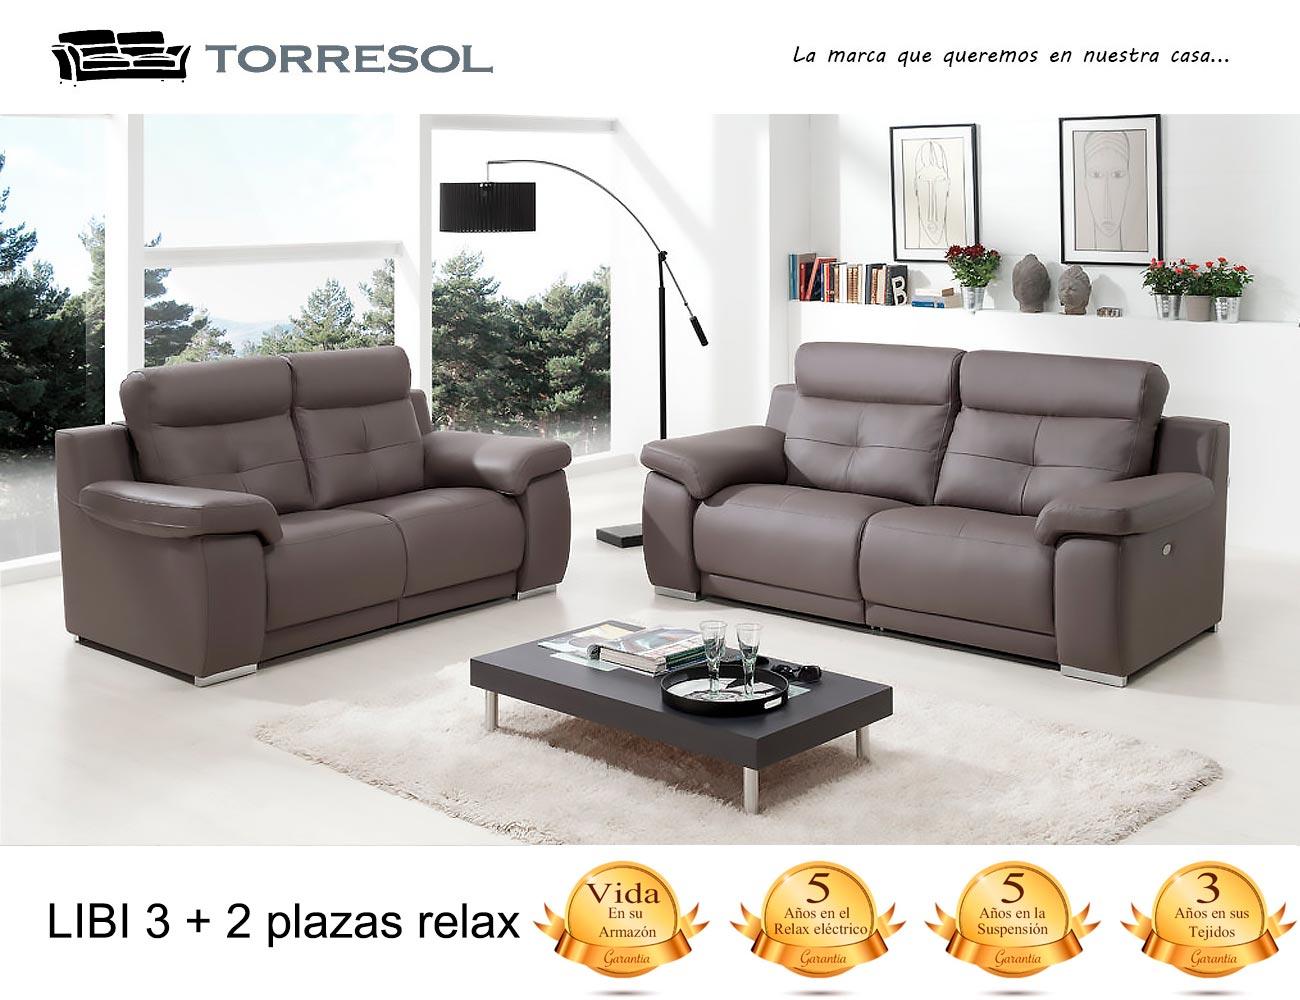 Sofa libi torresol en piel chocolate 21